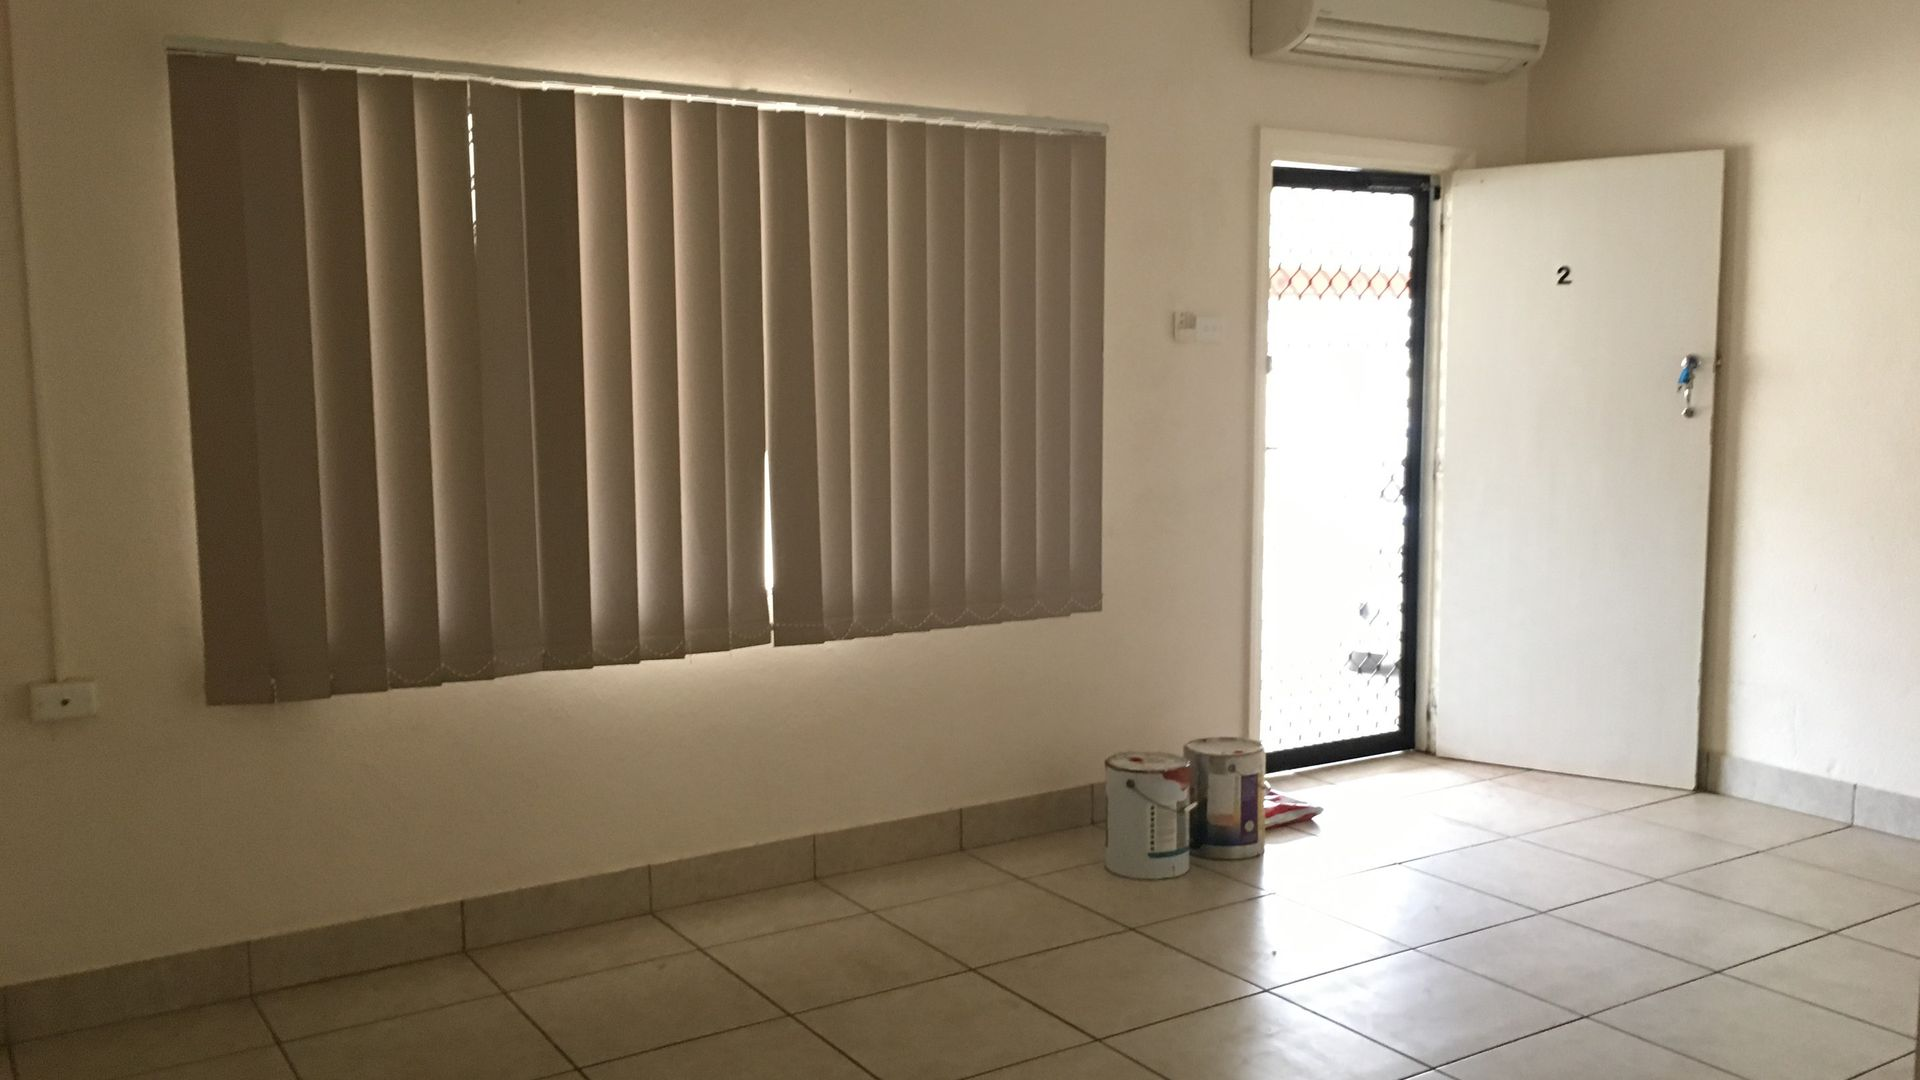 2/43 Noakes Avenue, Mount Isa QLD 4825, Image 2